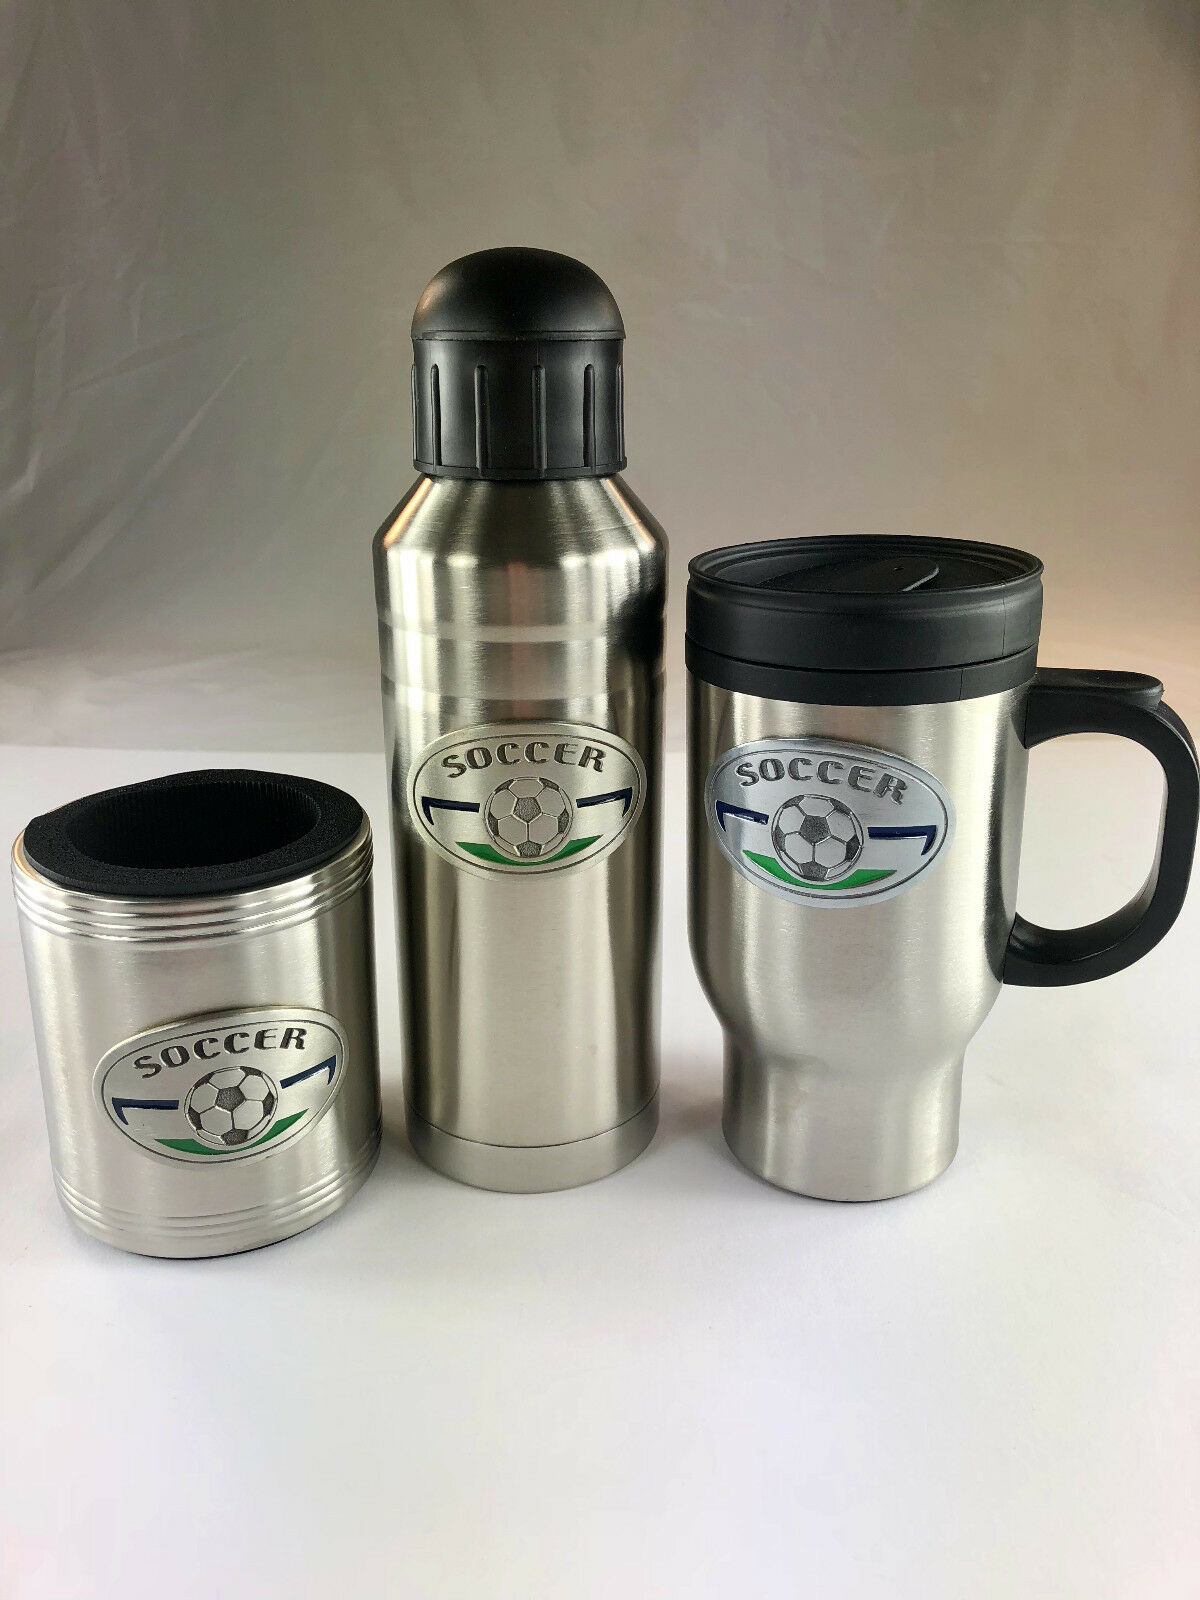 Soccer Stainless Steel Coffee Mug, Sport Bottle & Koozie (SET) Soccer Emblem